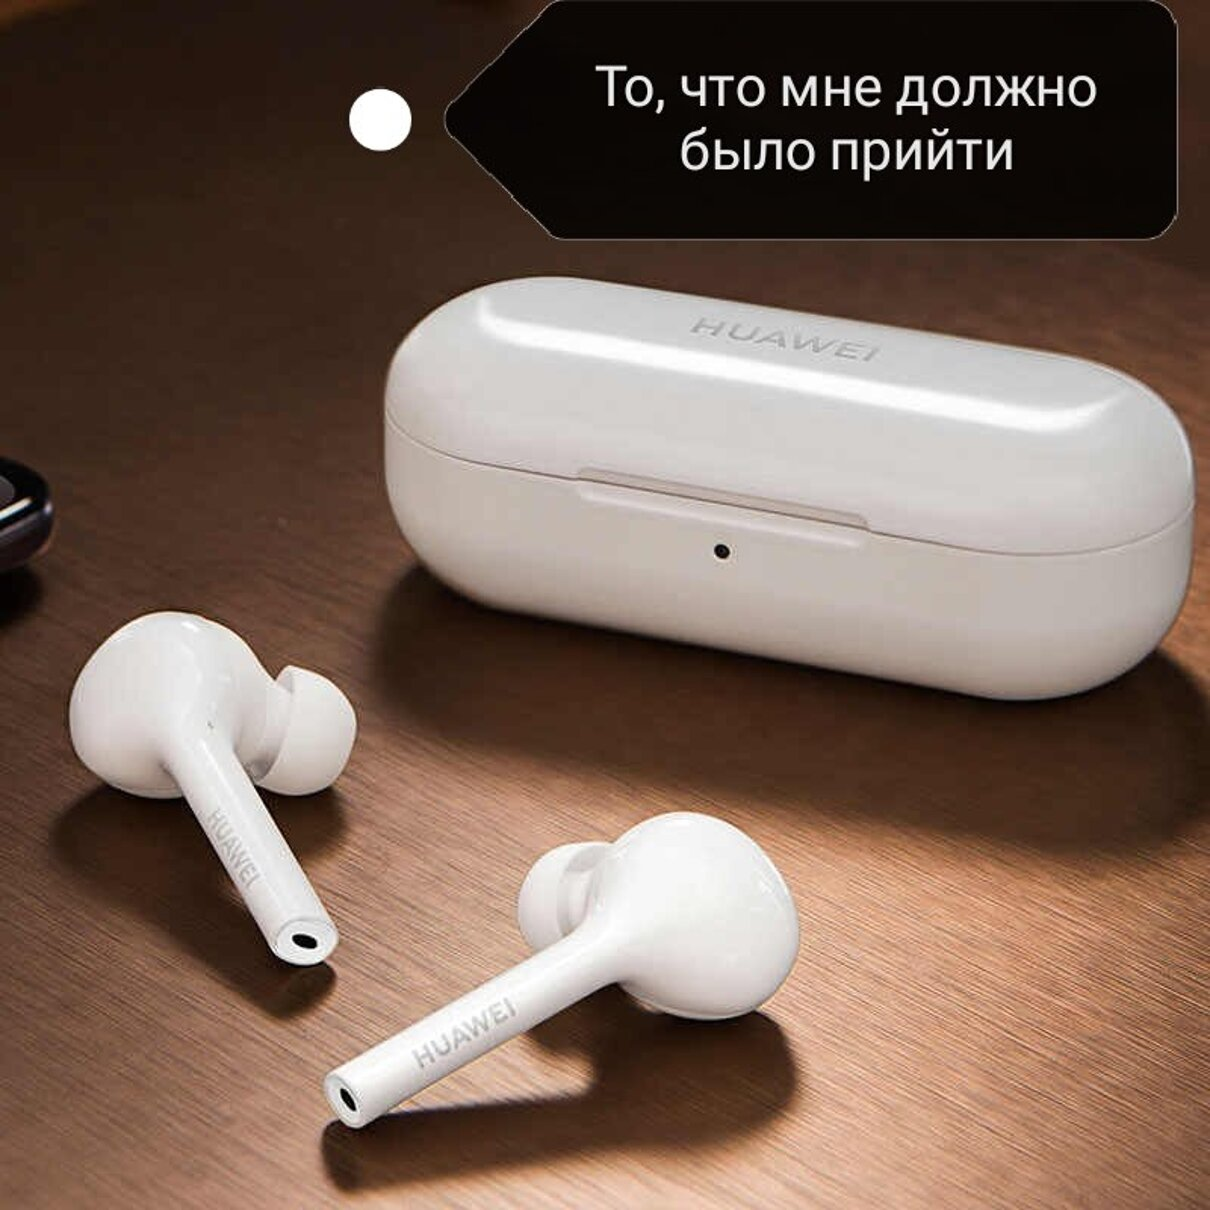 Жалоба-отзыв: Client@russianpost.ru - Пришёл не тот товар